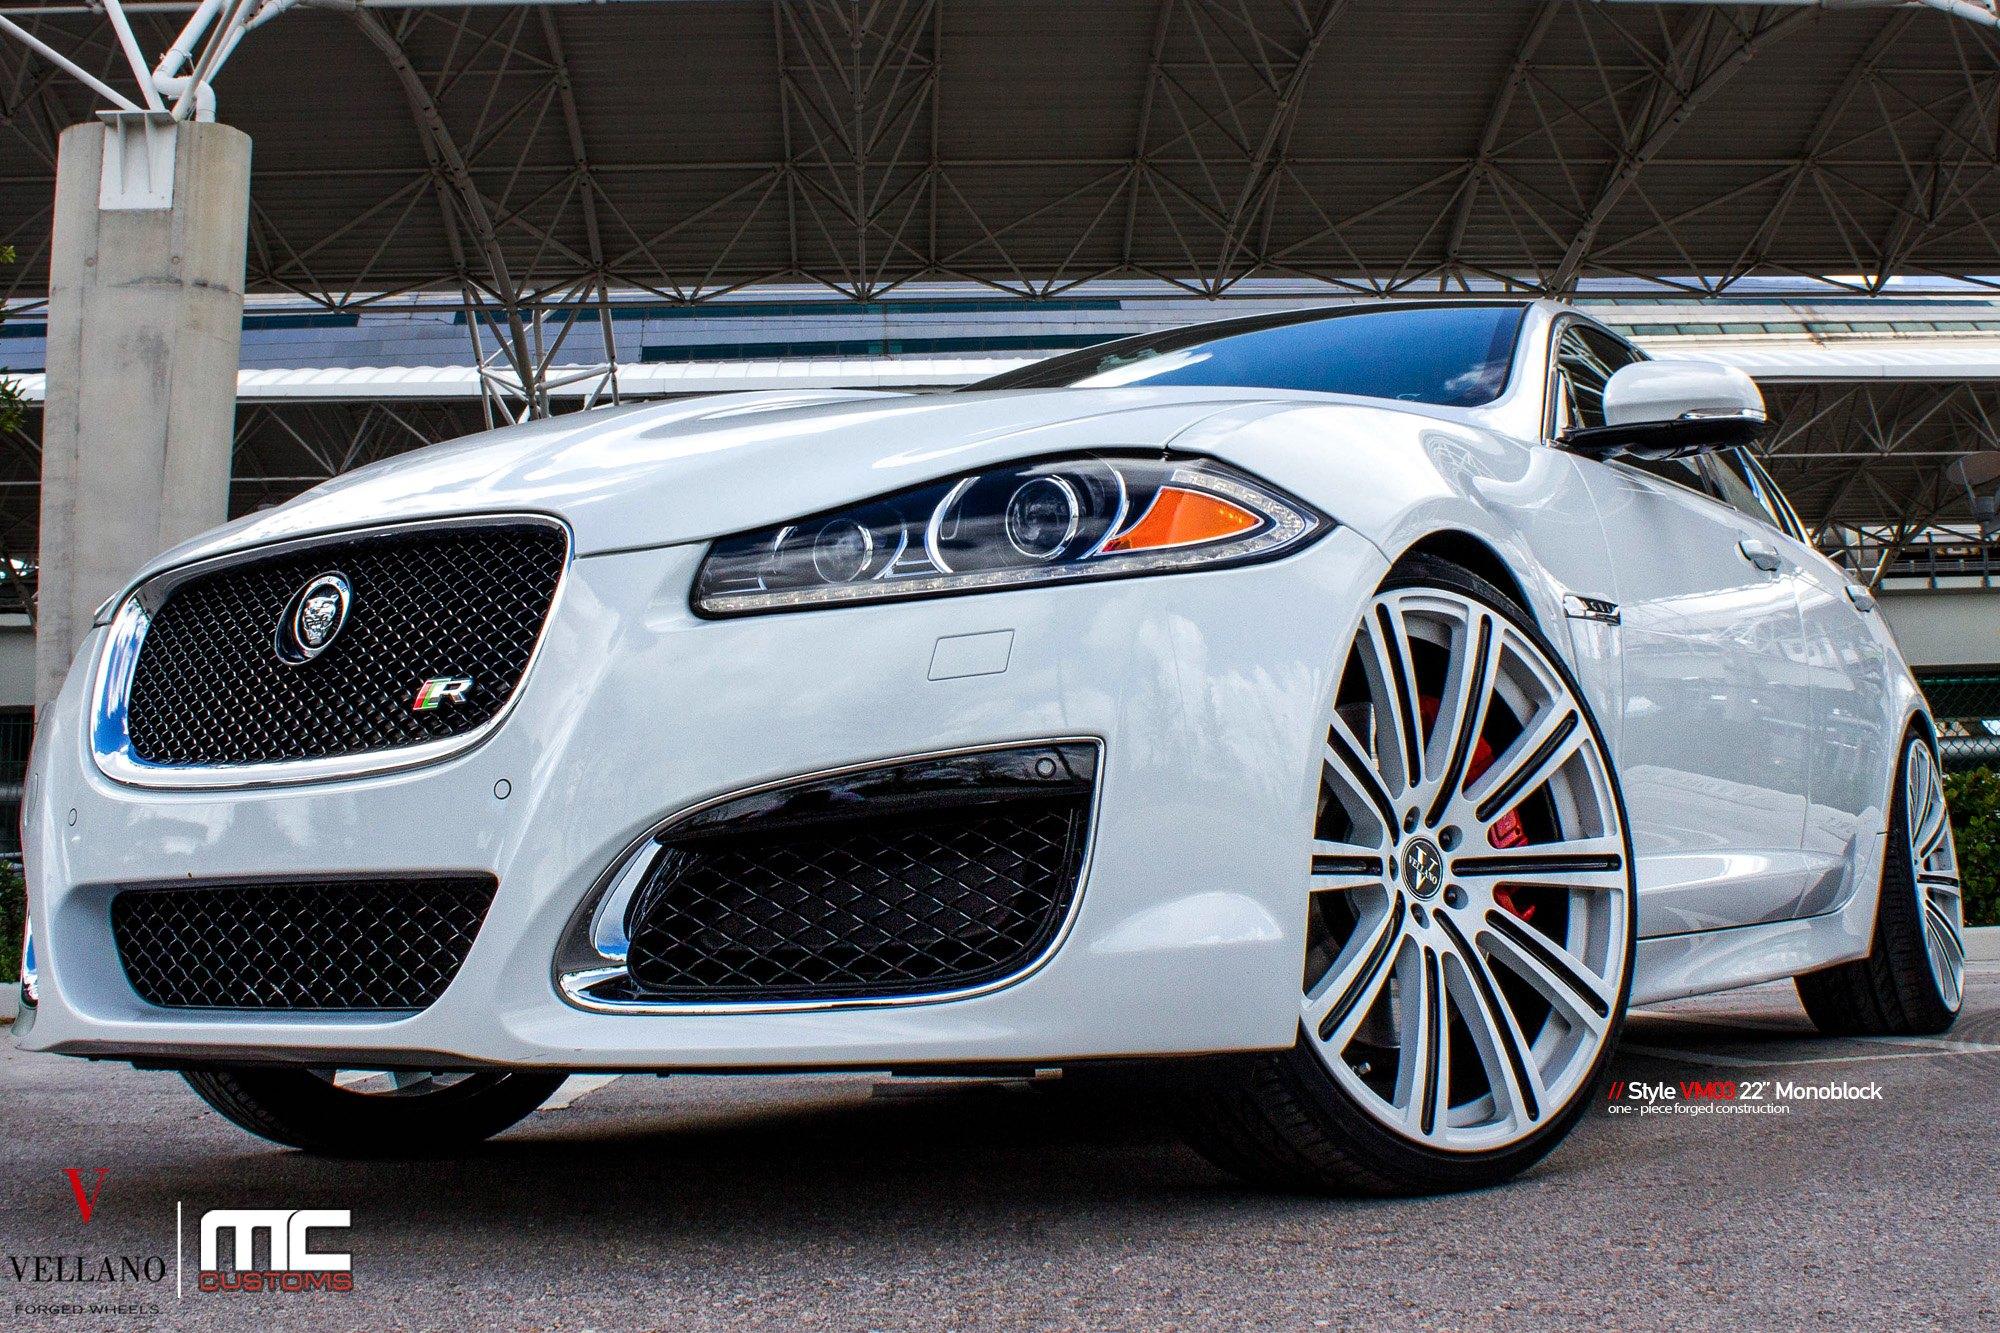 My Kia Performance >> Custom 2013 Jaguar XF | Images, Mods, Photos, Upgrades — CARiD.com Gallery